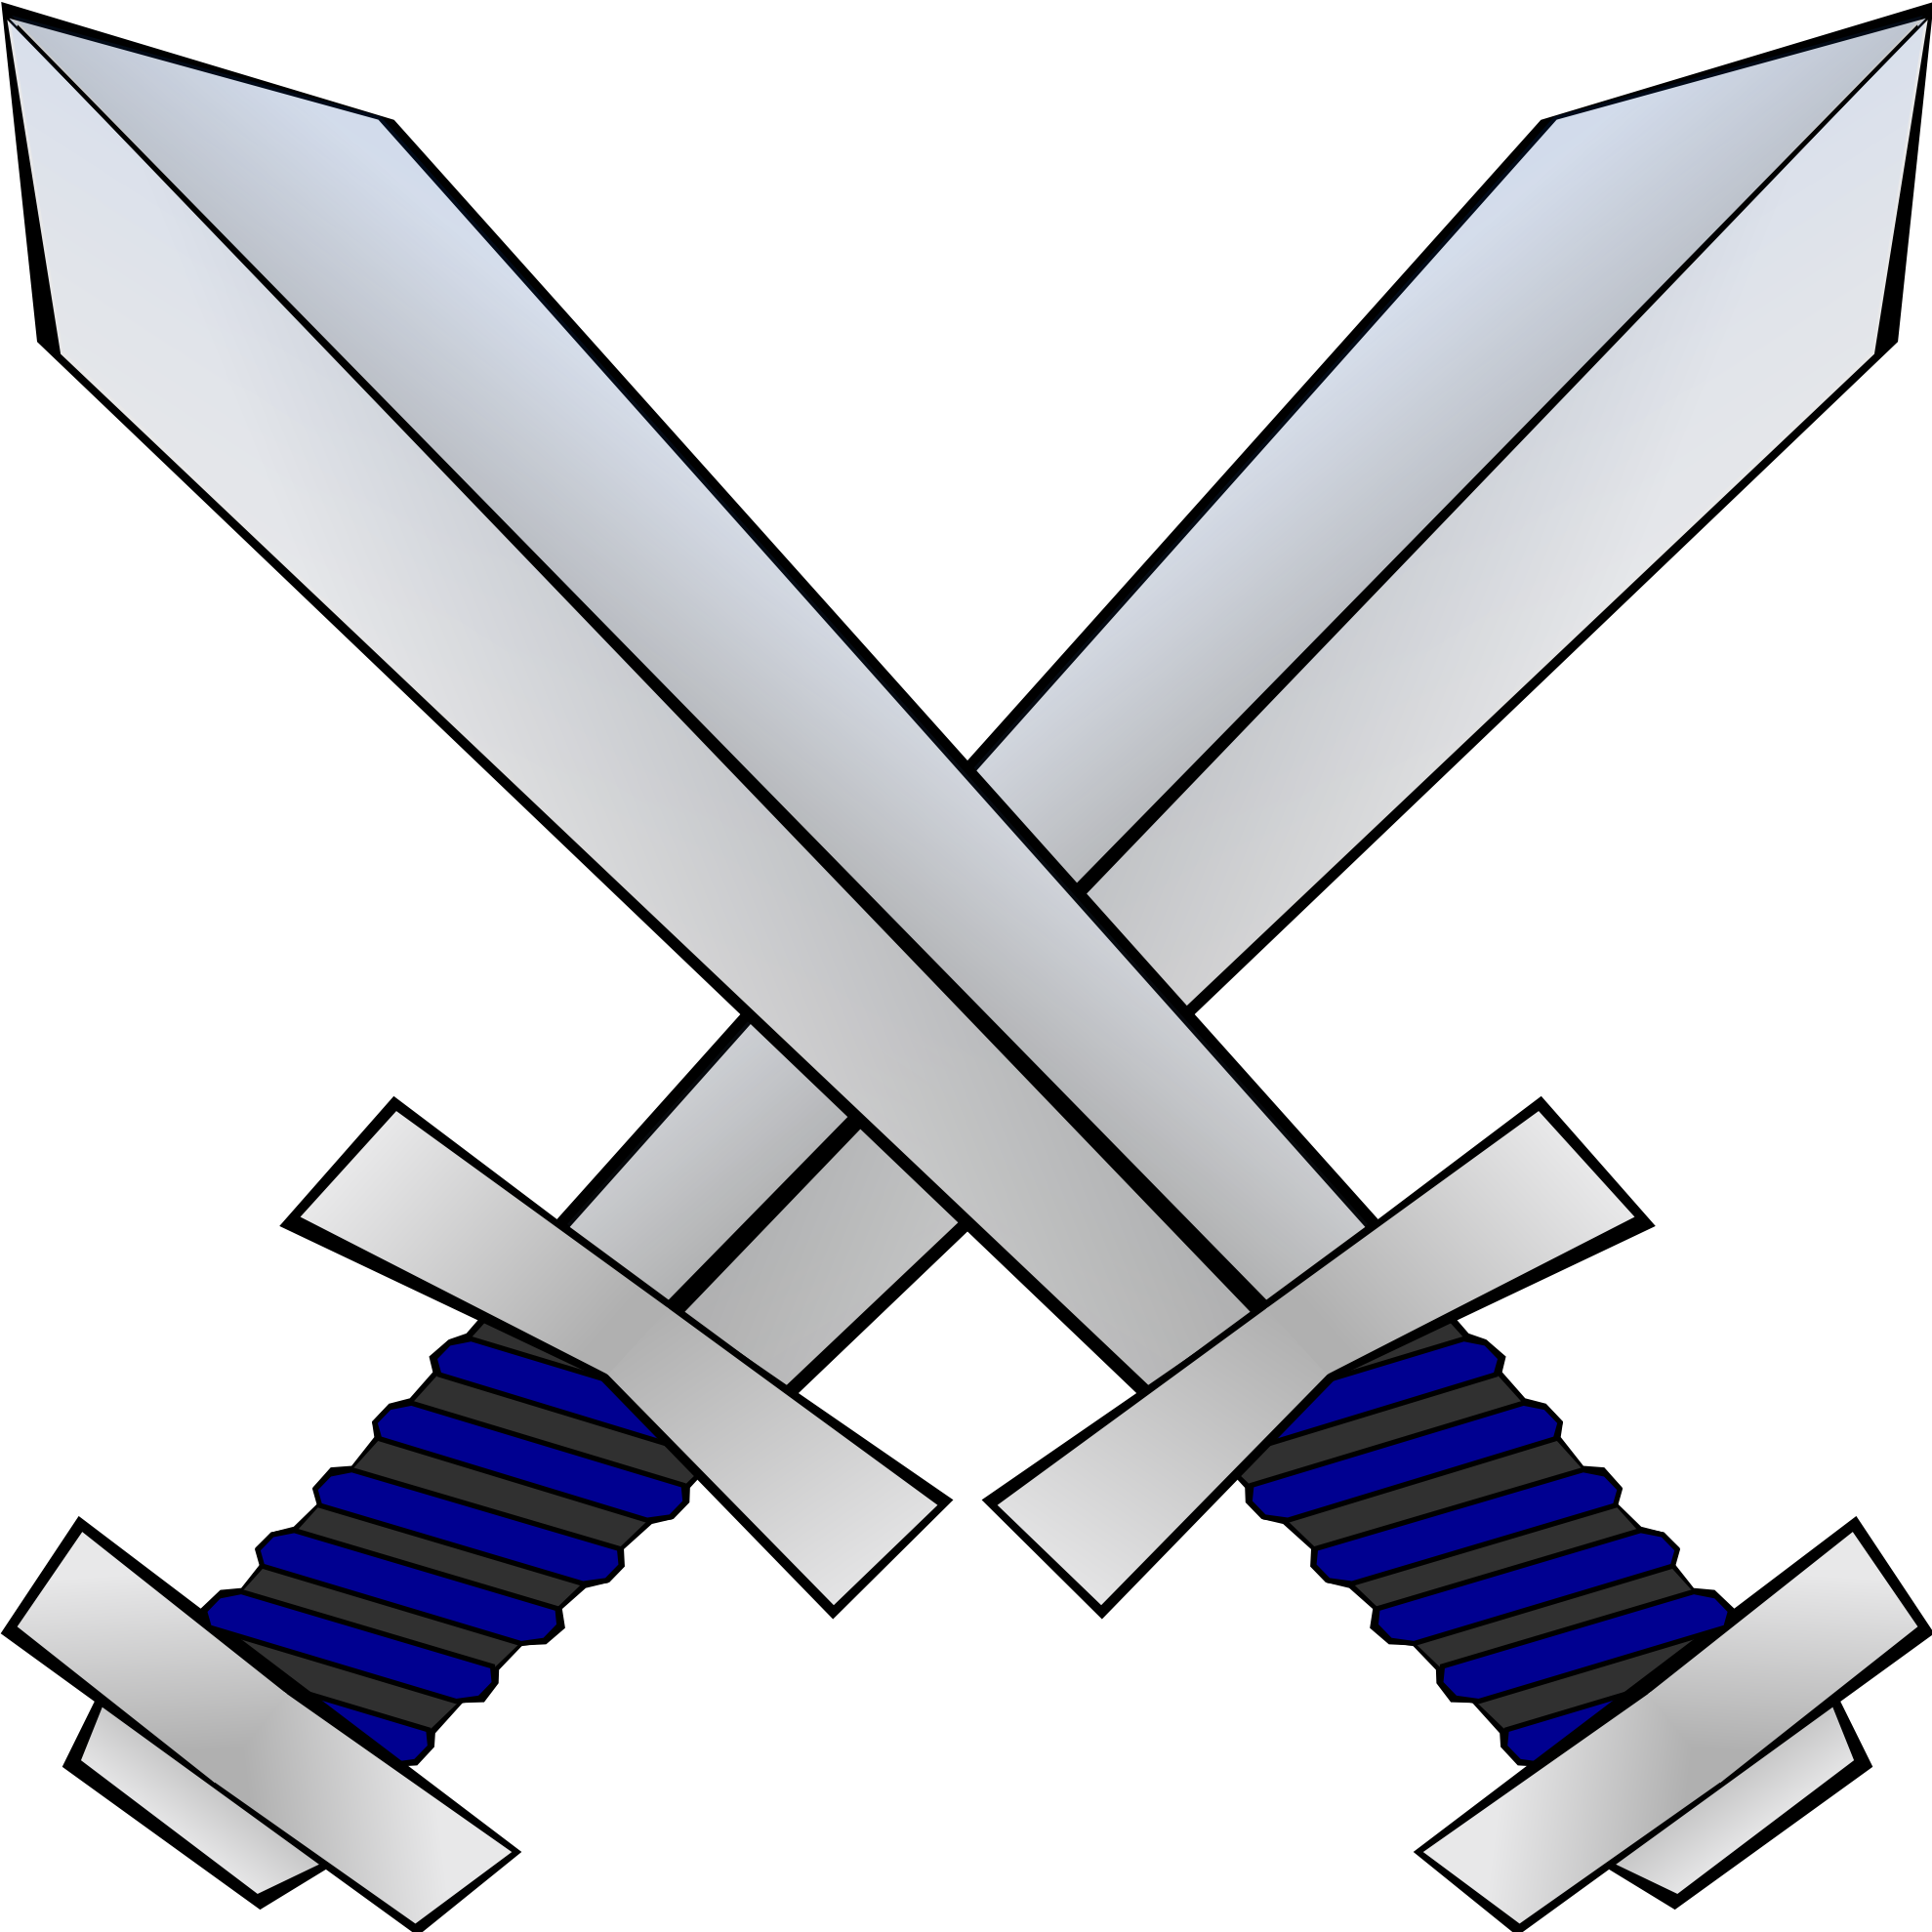 Clip art sword cliparts. Medieval clipart knight armor